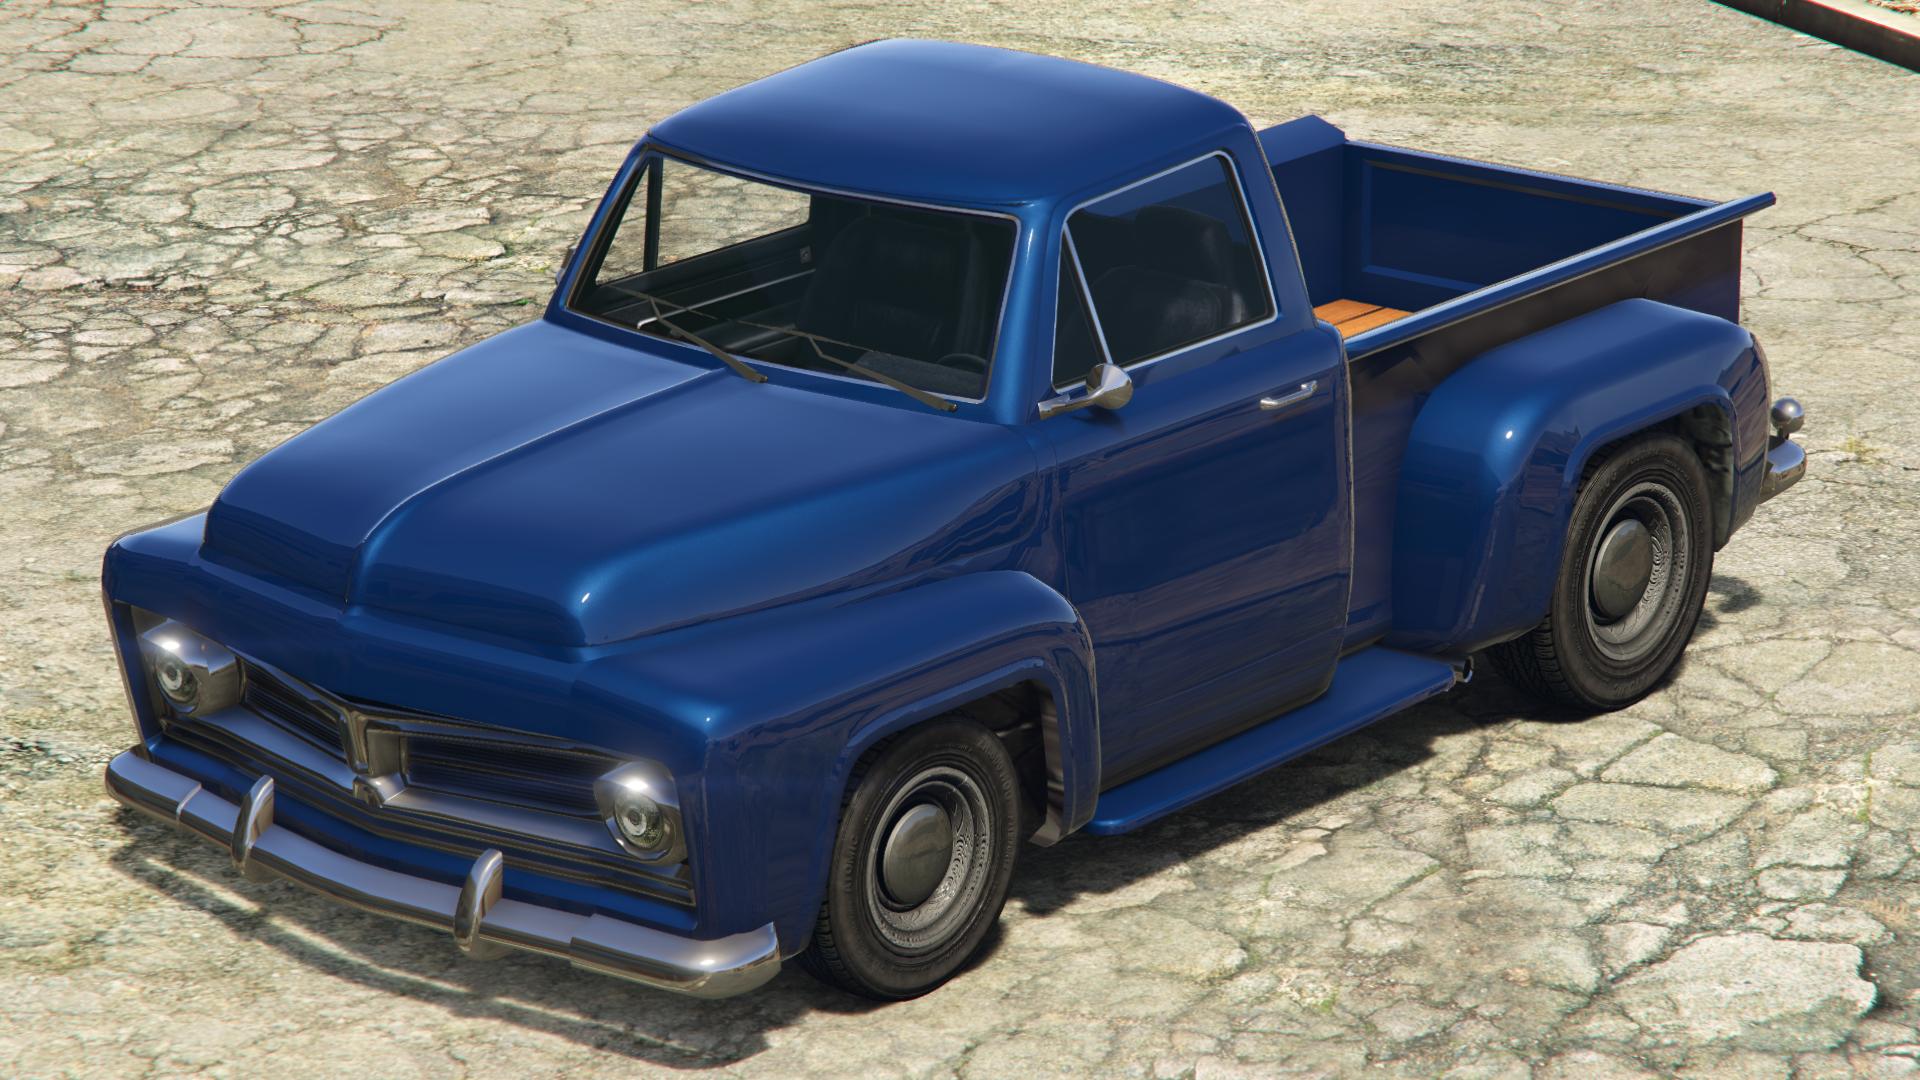 Truck HD PNG - 95721